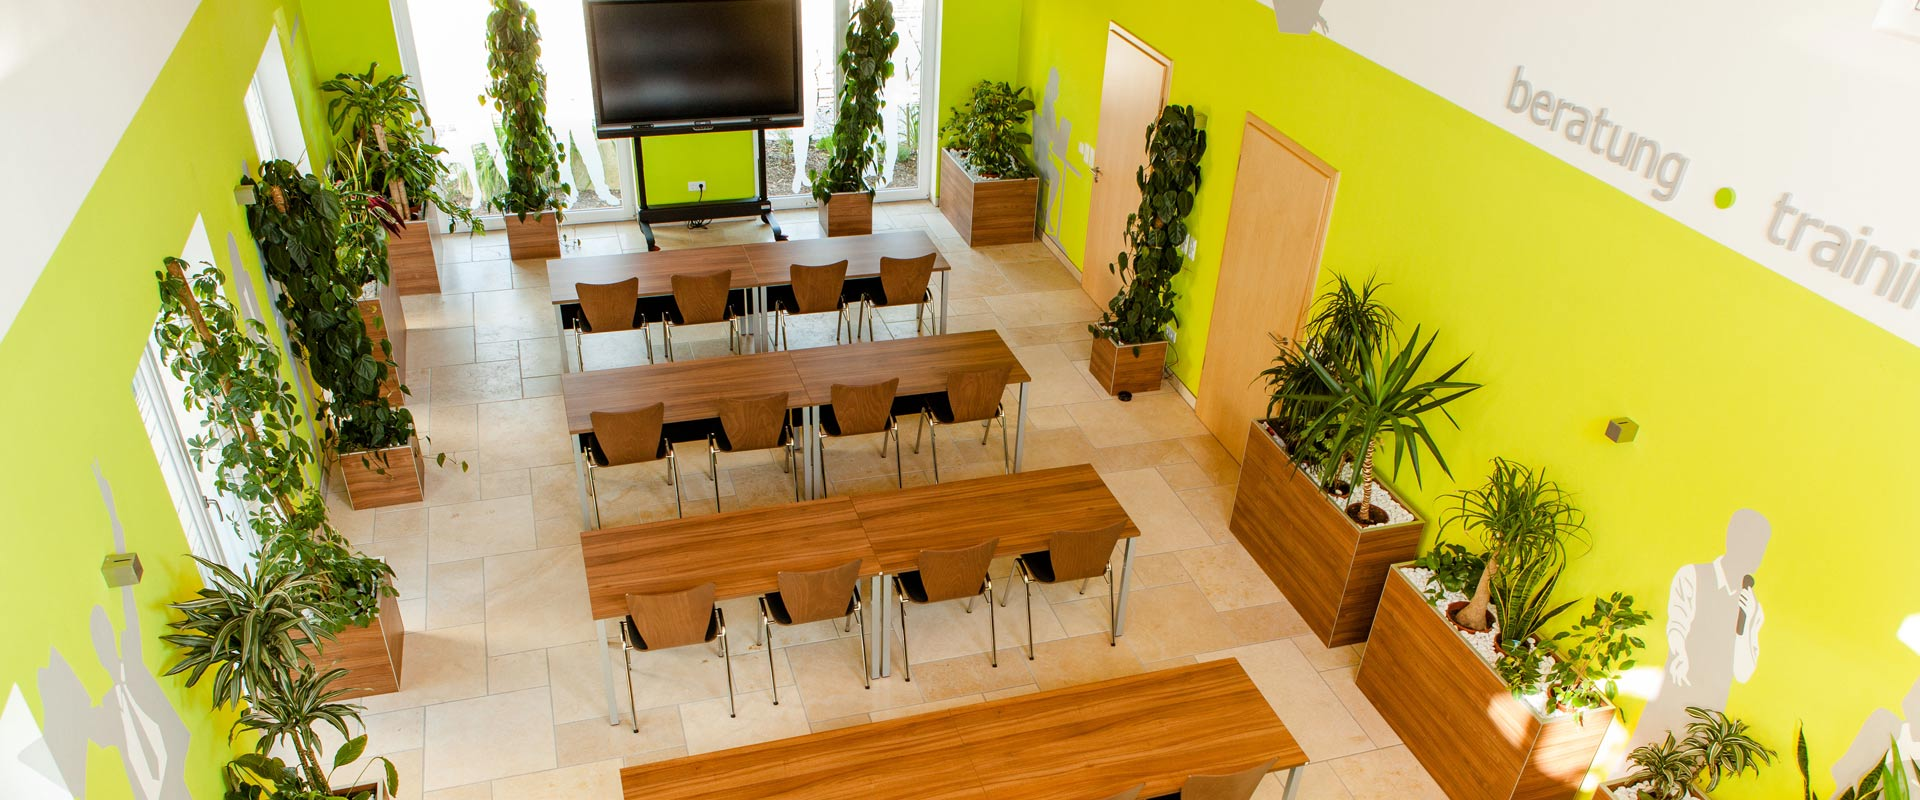 Seminarhaus Grubers Schulungsbestuhlung